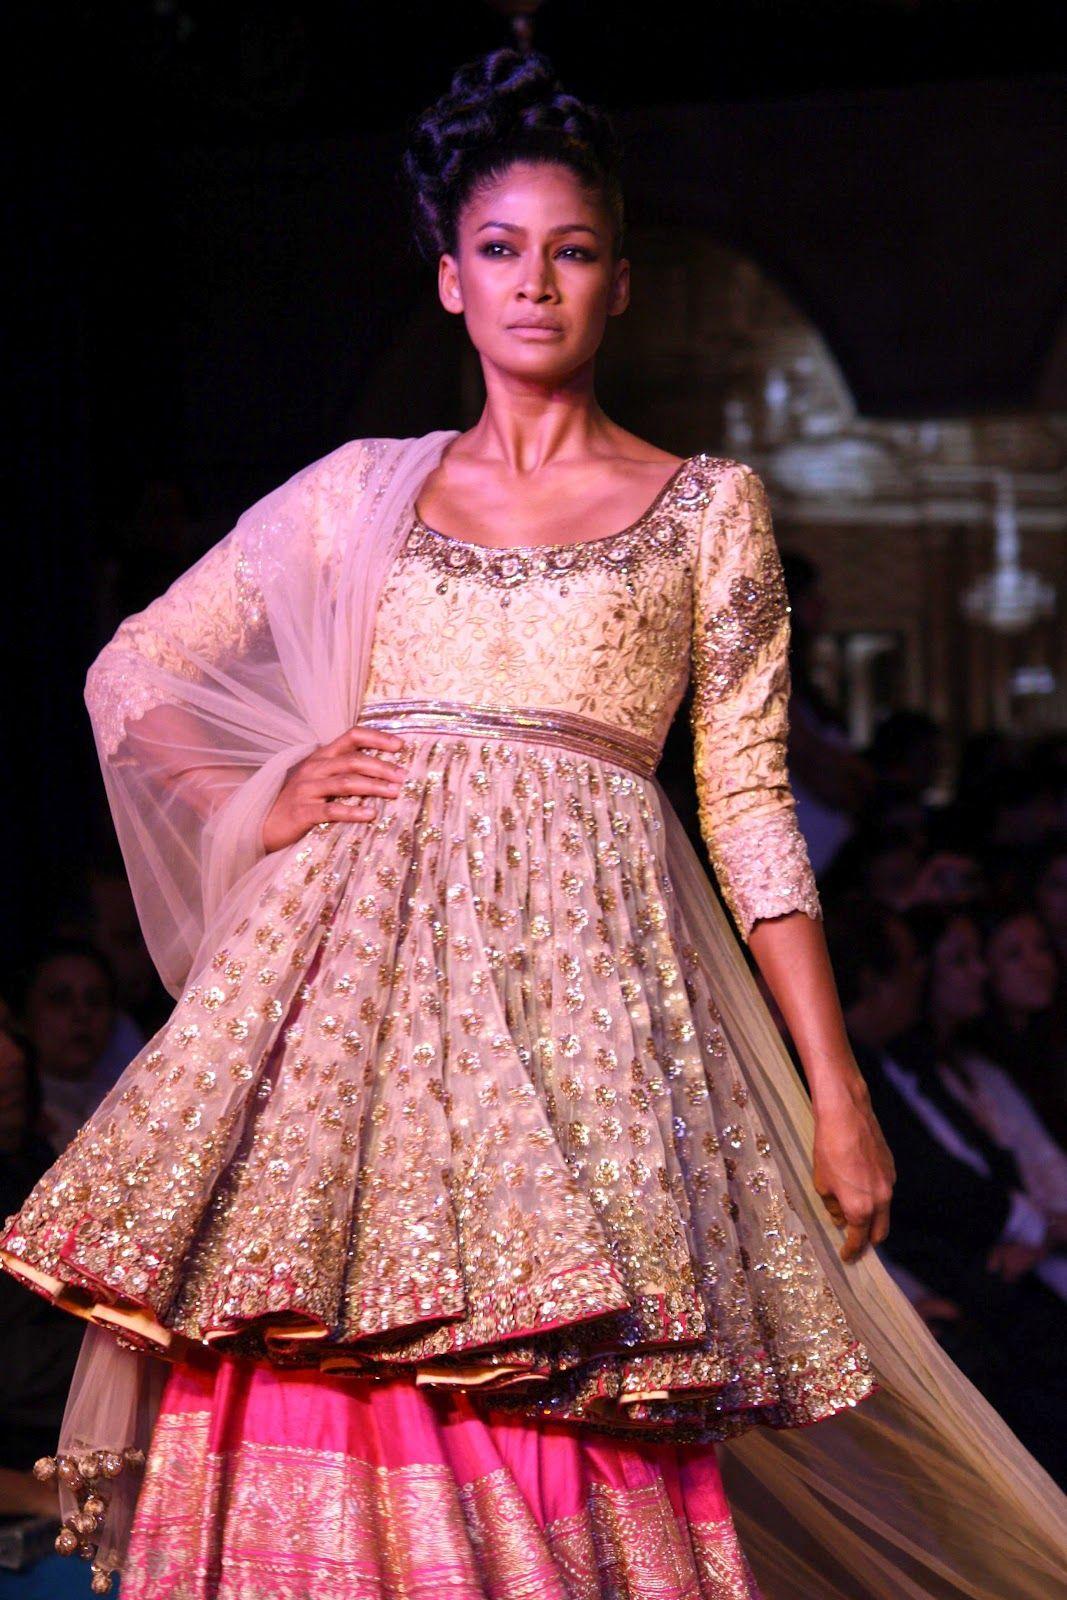 manish malhotra | Manish Malhotra at DCW | PCJ Delhi Couture Week ...